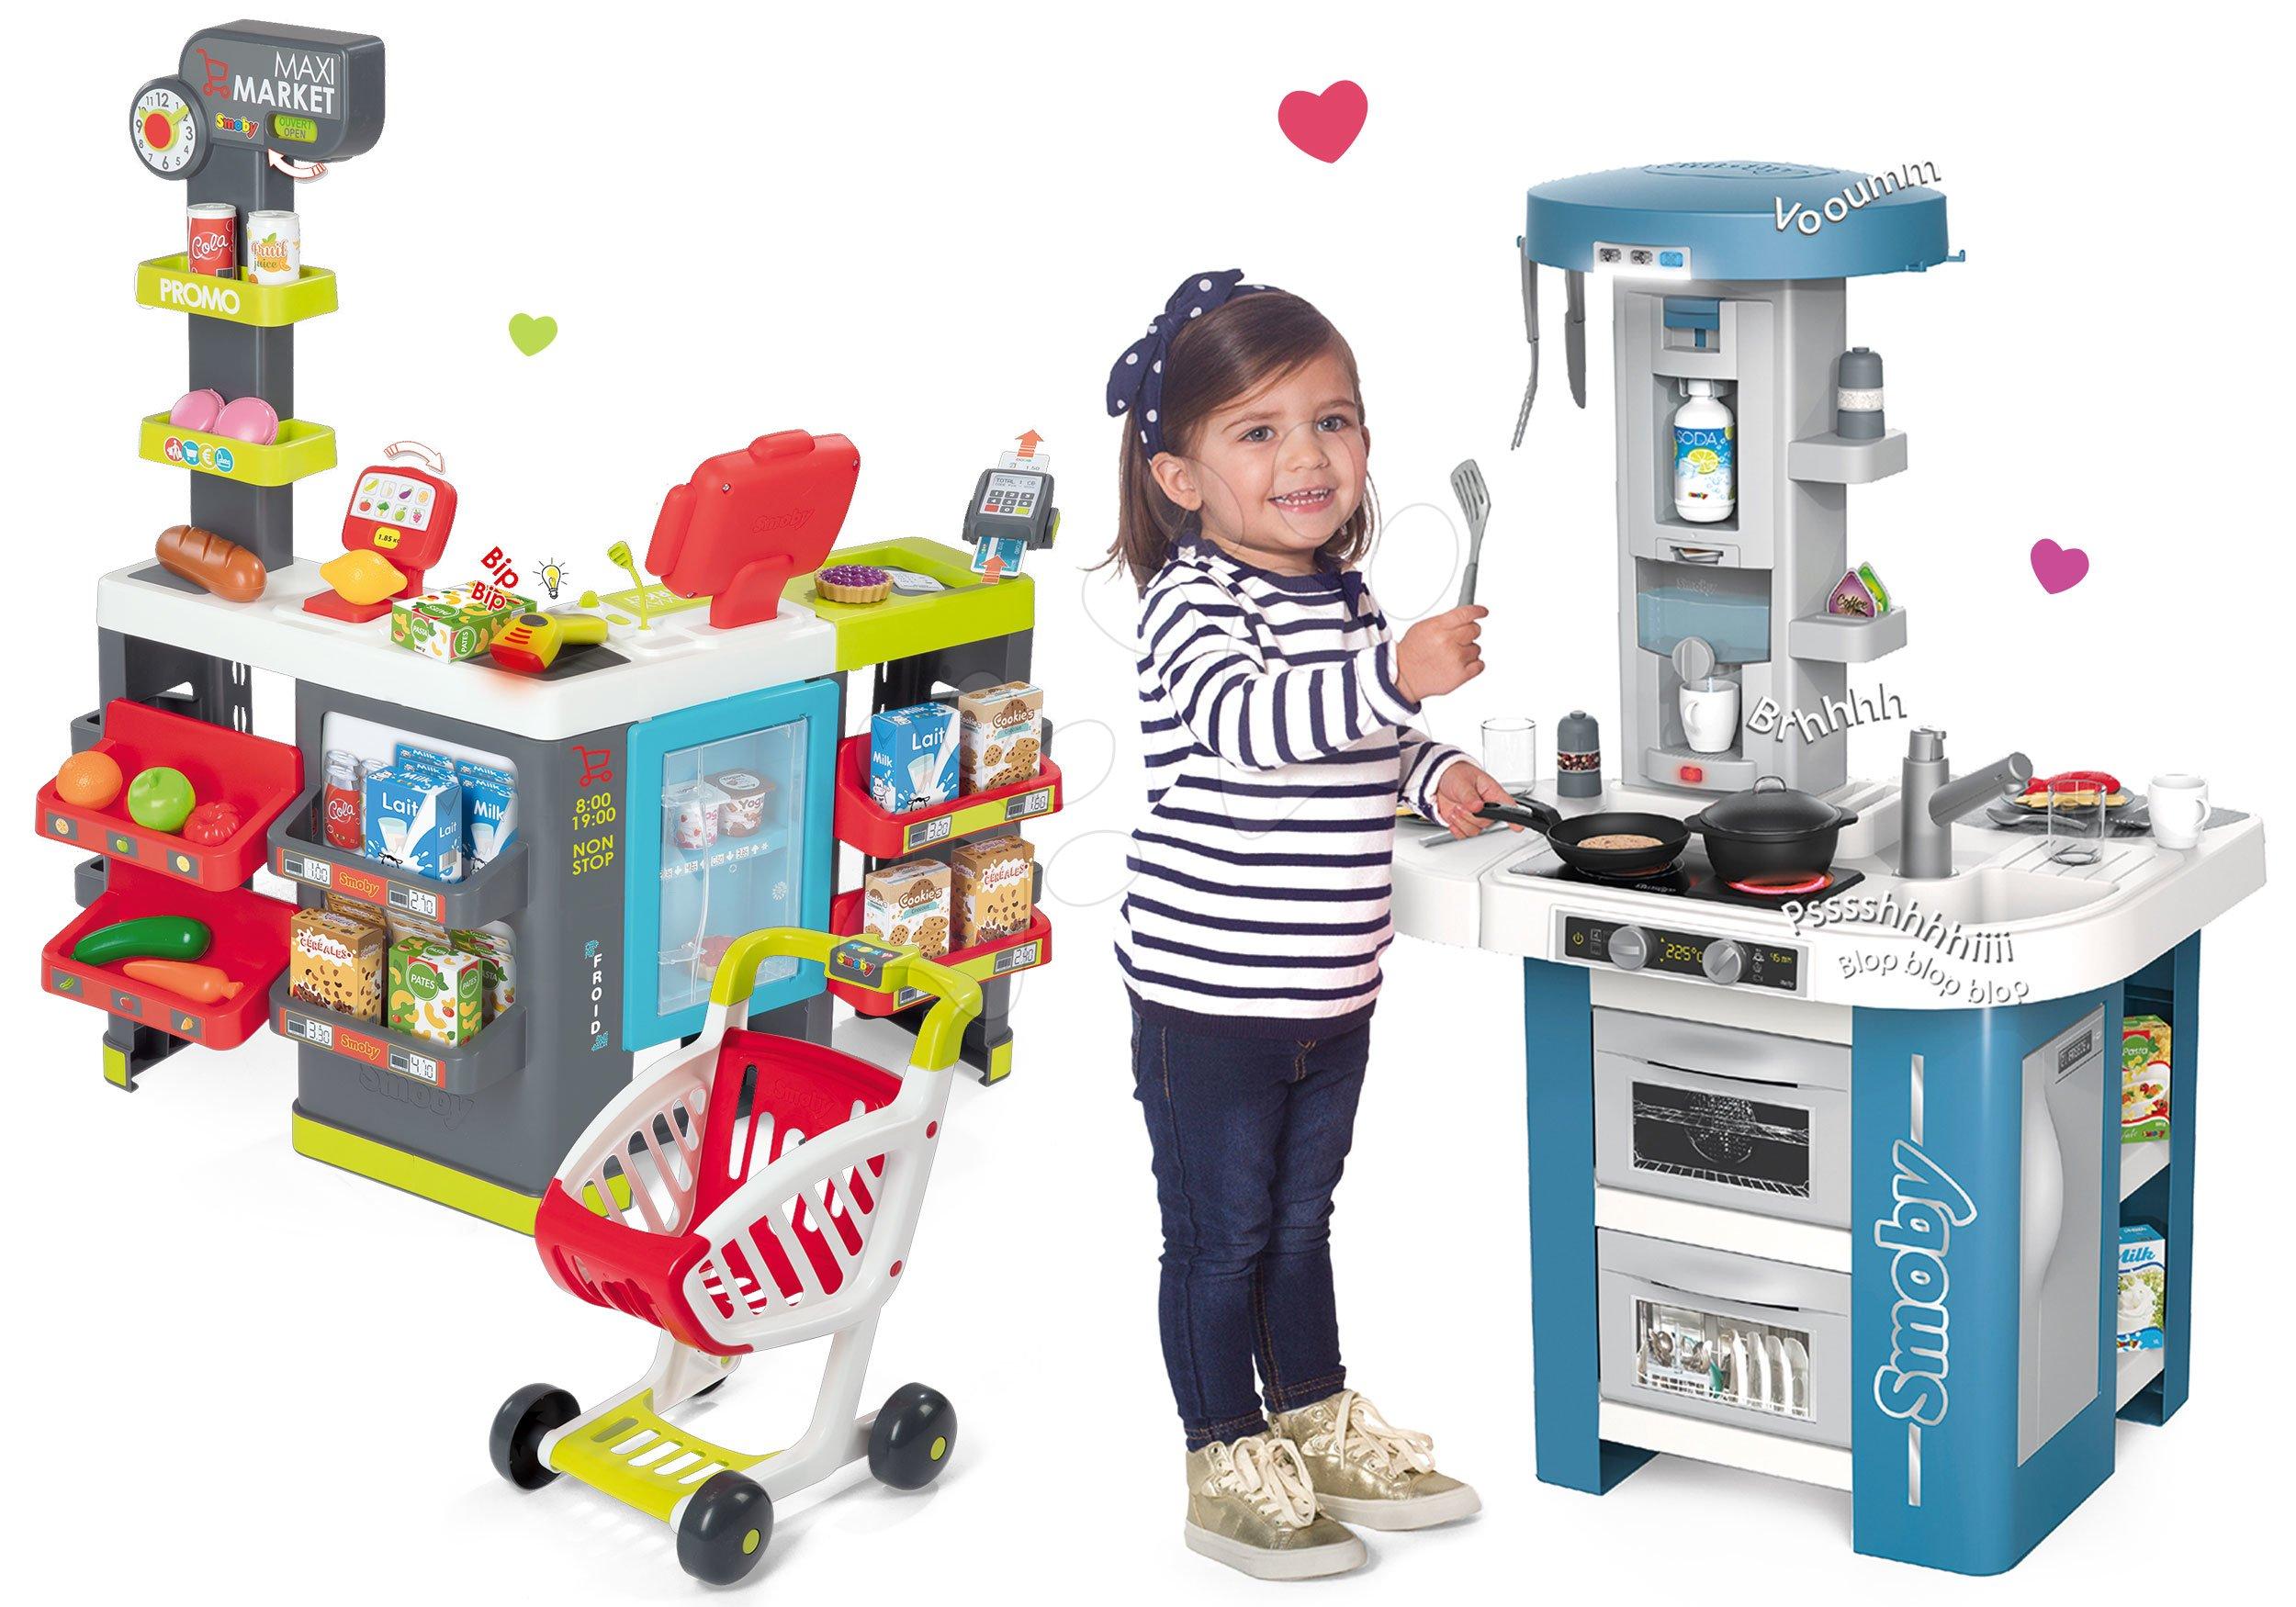 Set kuchynka s technickým vybavením Tech Edition Smoby elektronická so supermarketom Maxi Market a chladiacim boxom